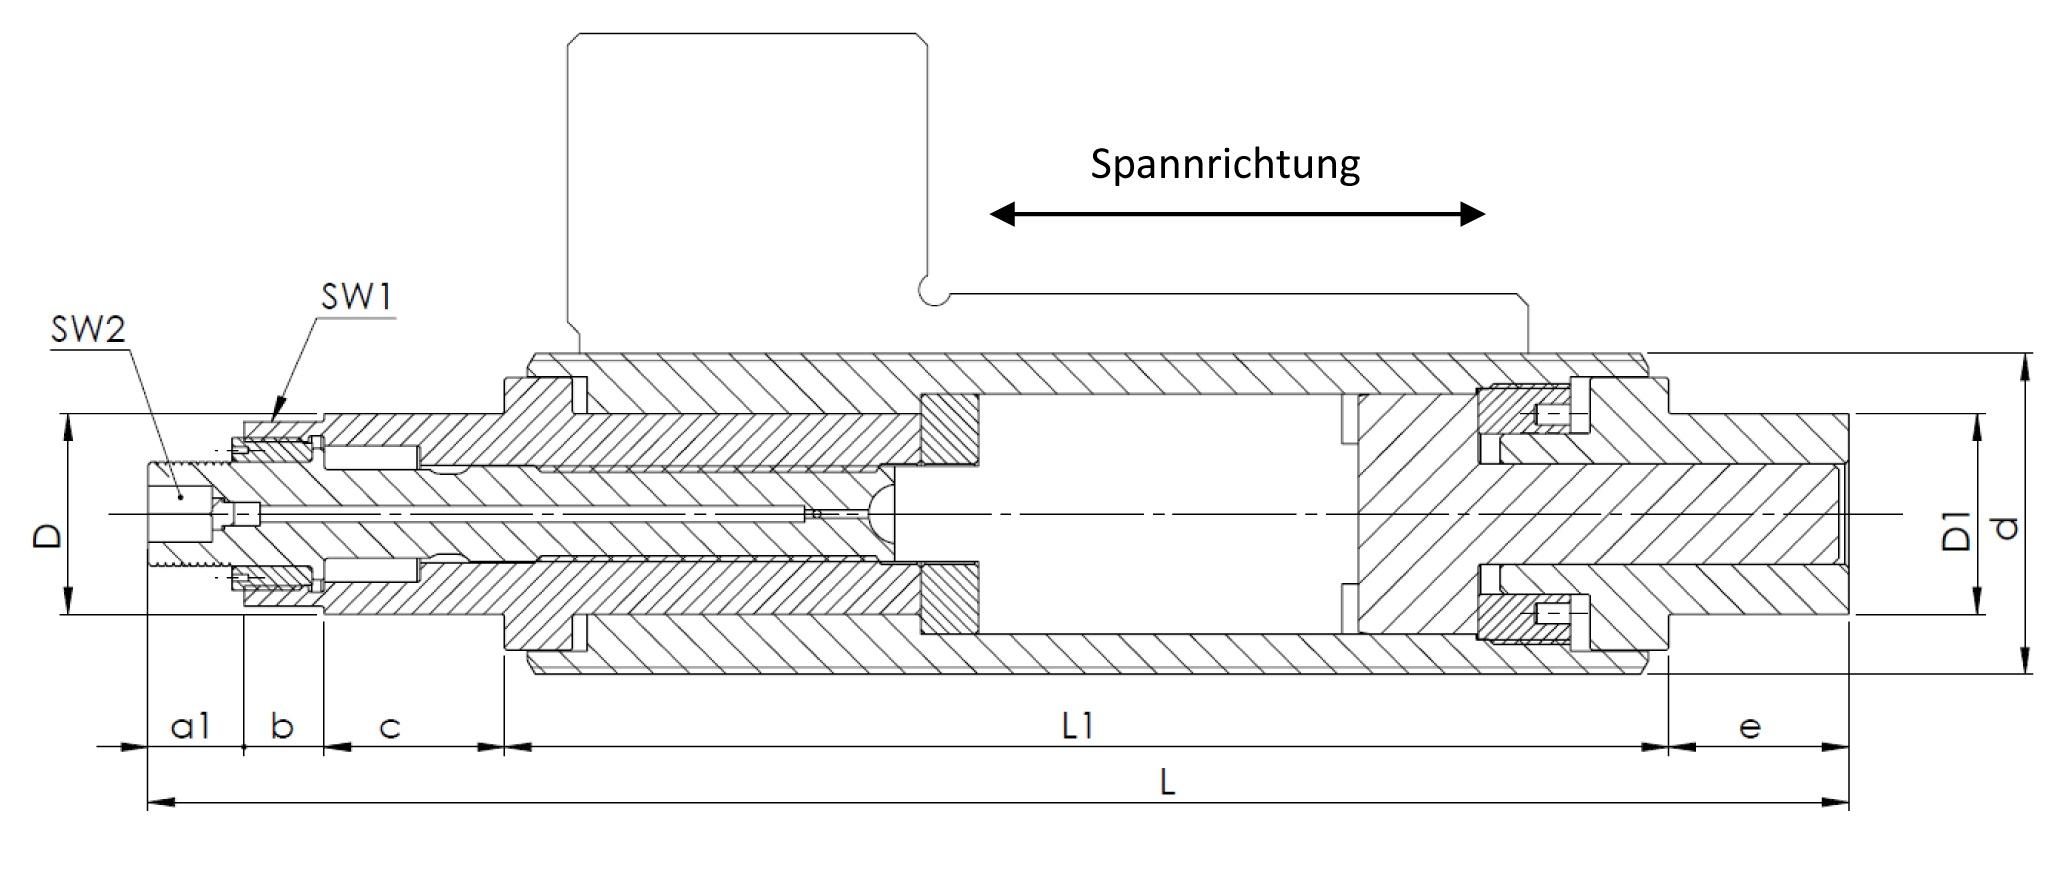 Mech-Spannspindel_OSP-IA